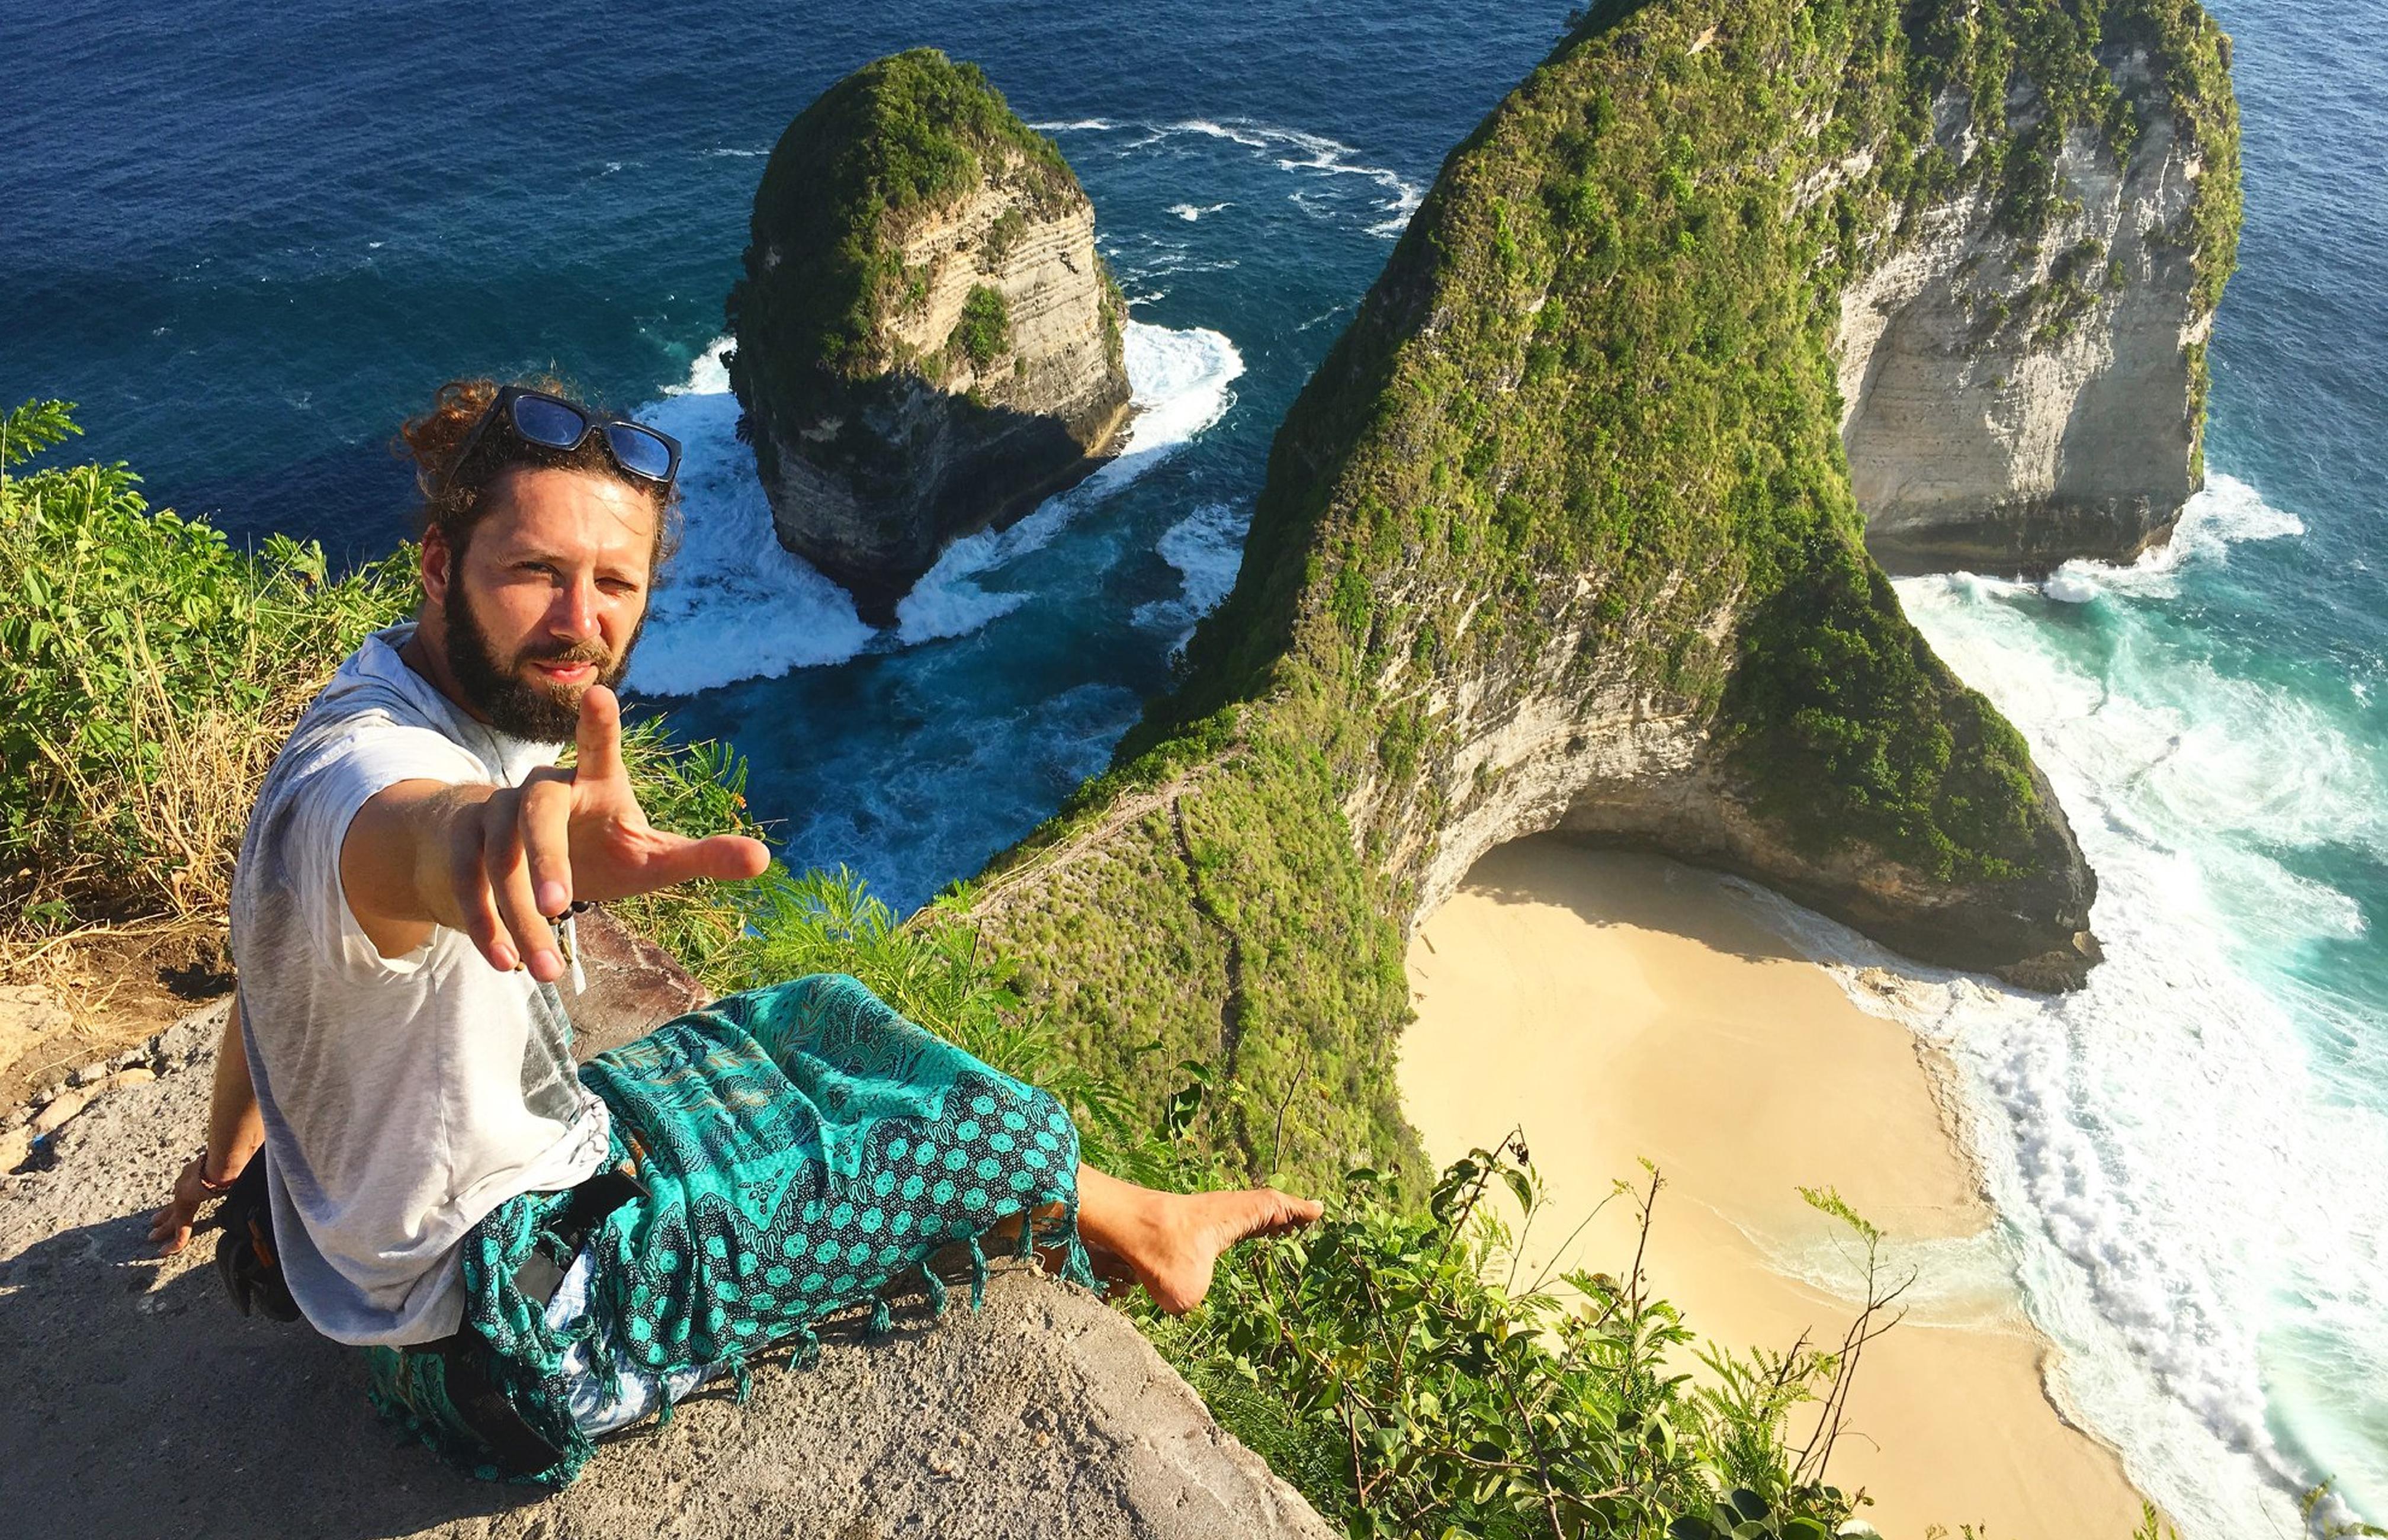 Indonesia, Nusa Penida, kelingking , beach, ocean, cliff, Индонезия, Нуса Пенида, келингки, океан, утес